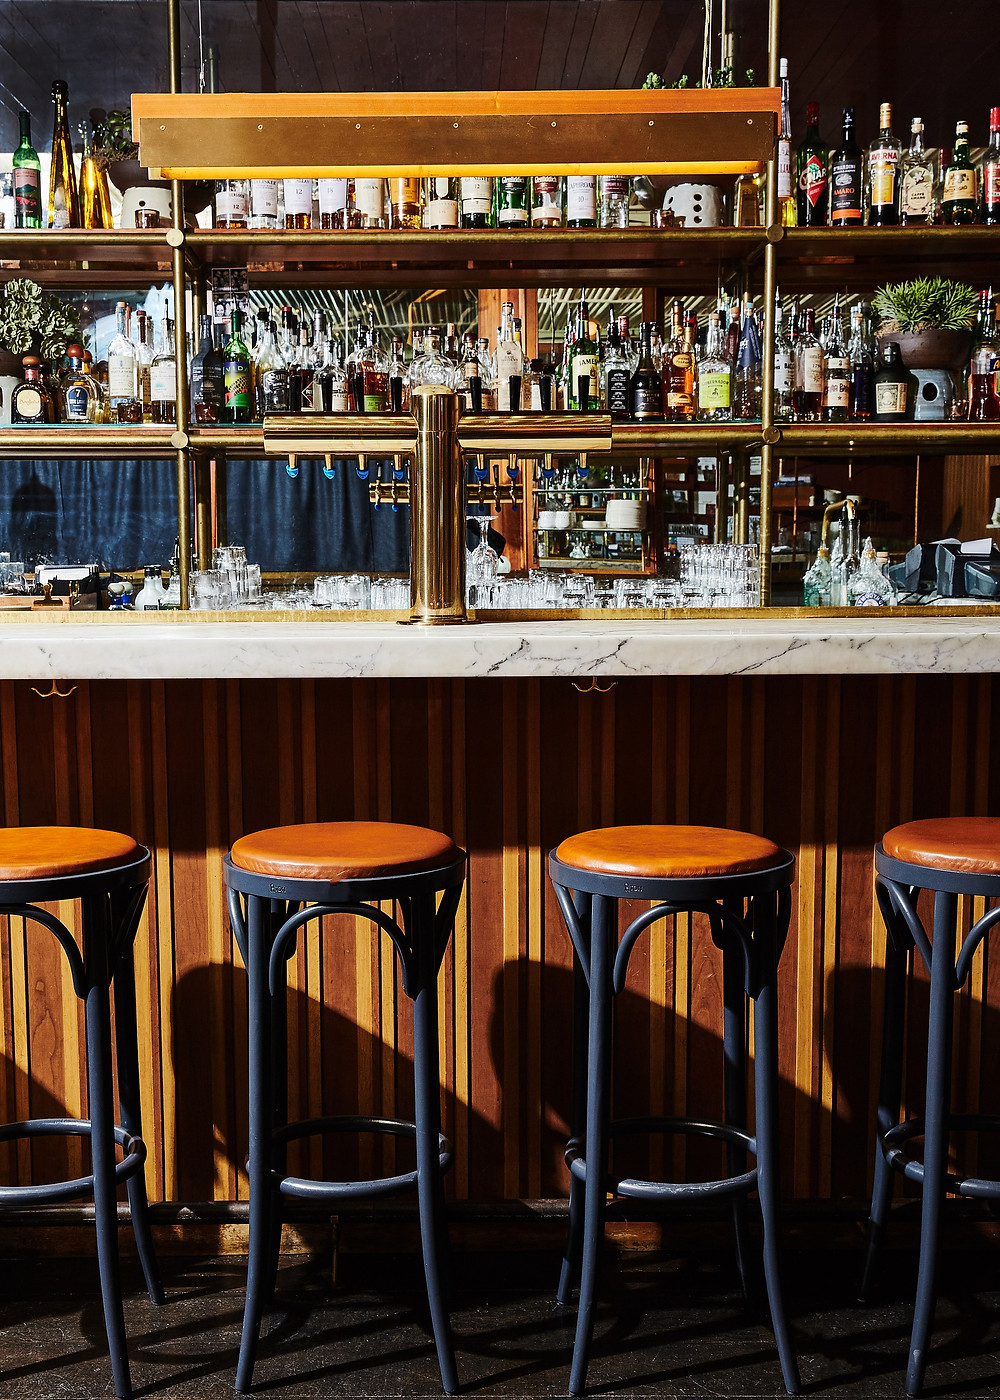 No Bar photo by Alex Lau